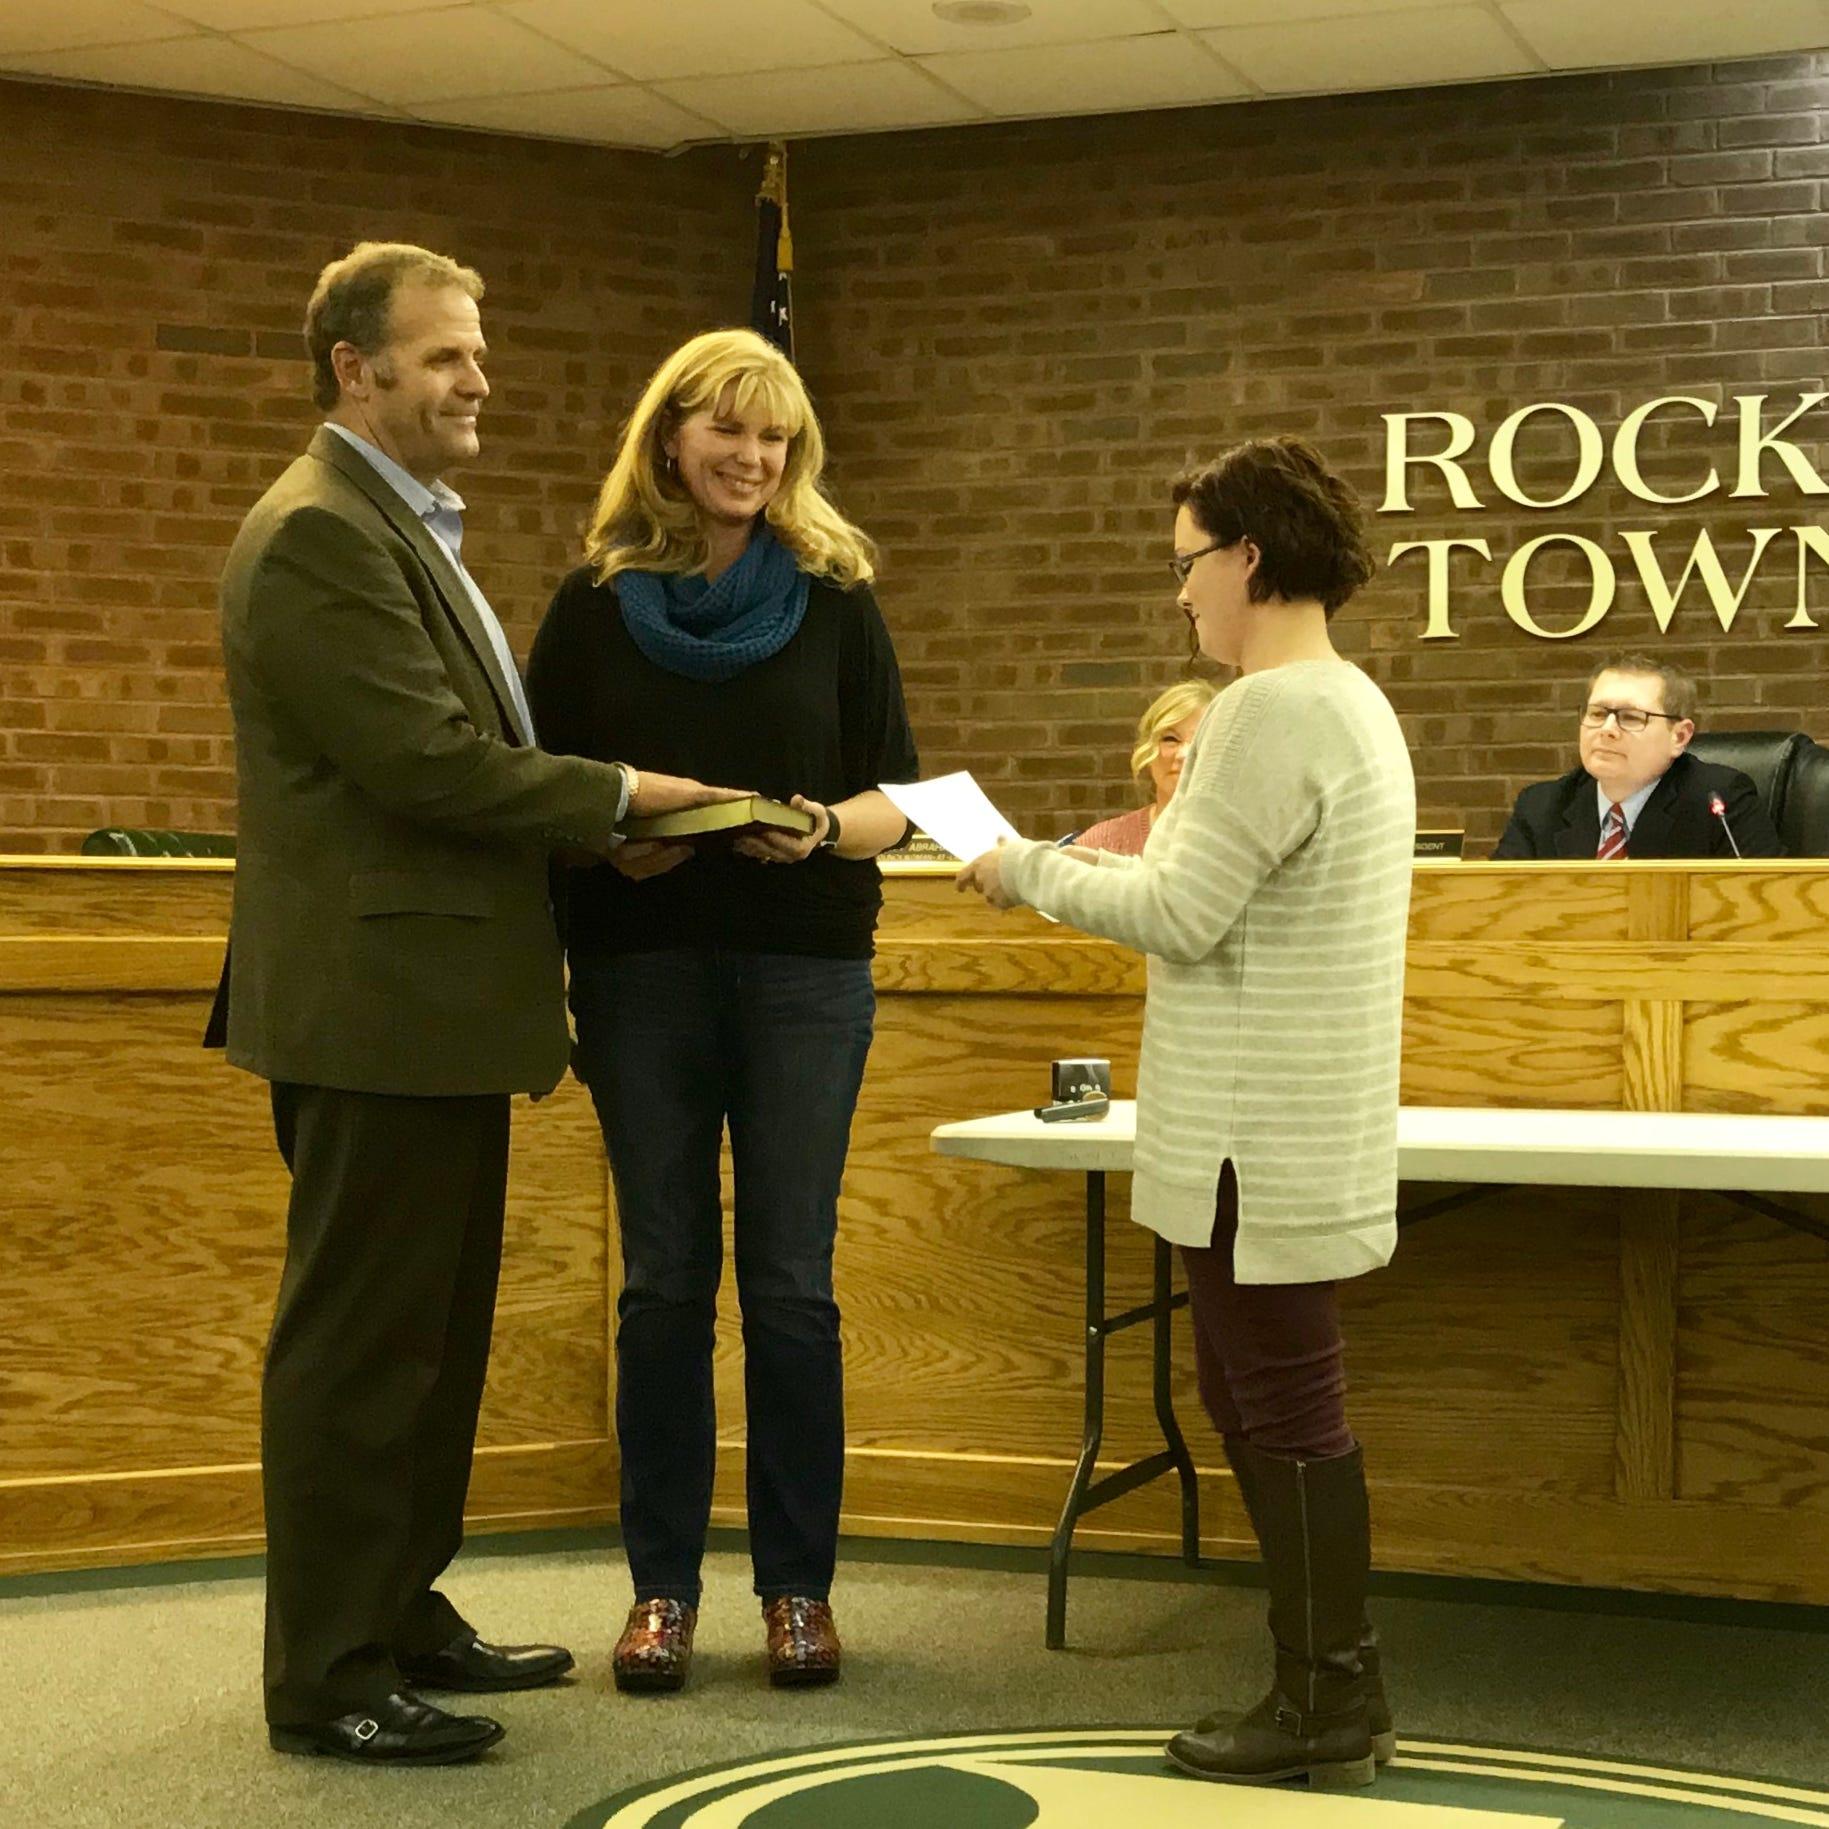 Rockaway Twp: Three to vie for mayor's seat; two incumbents won't run